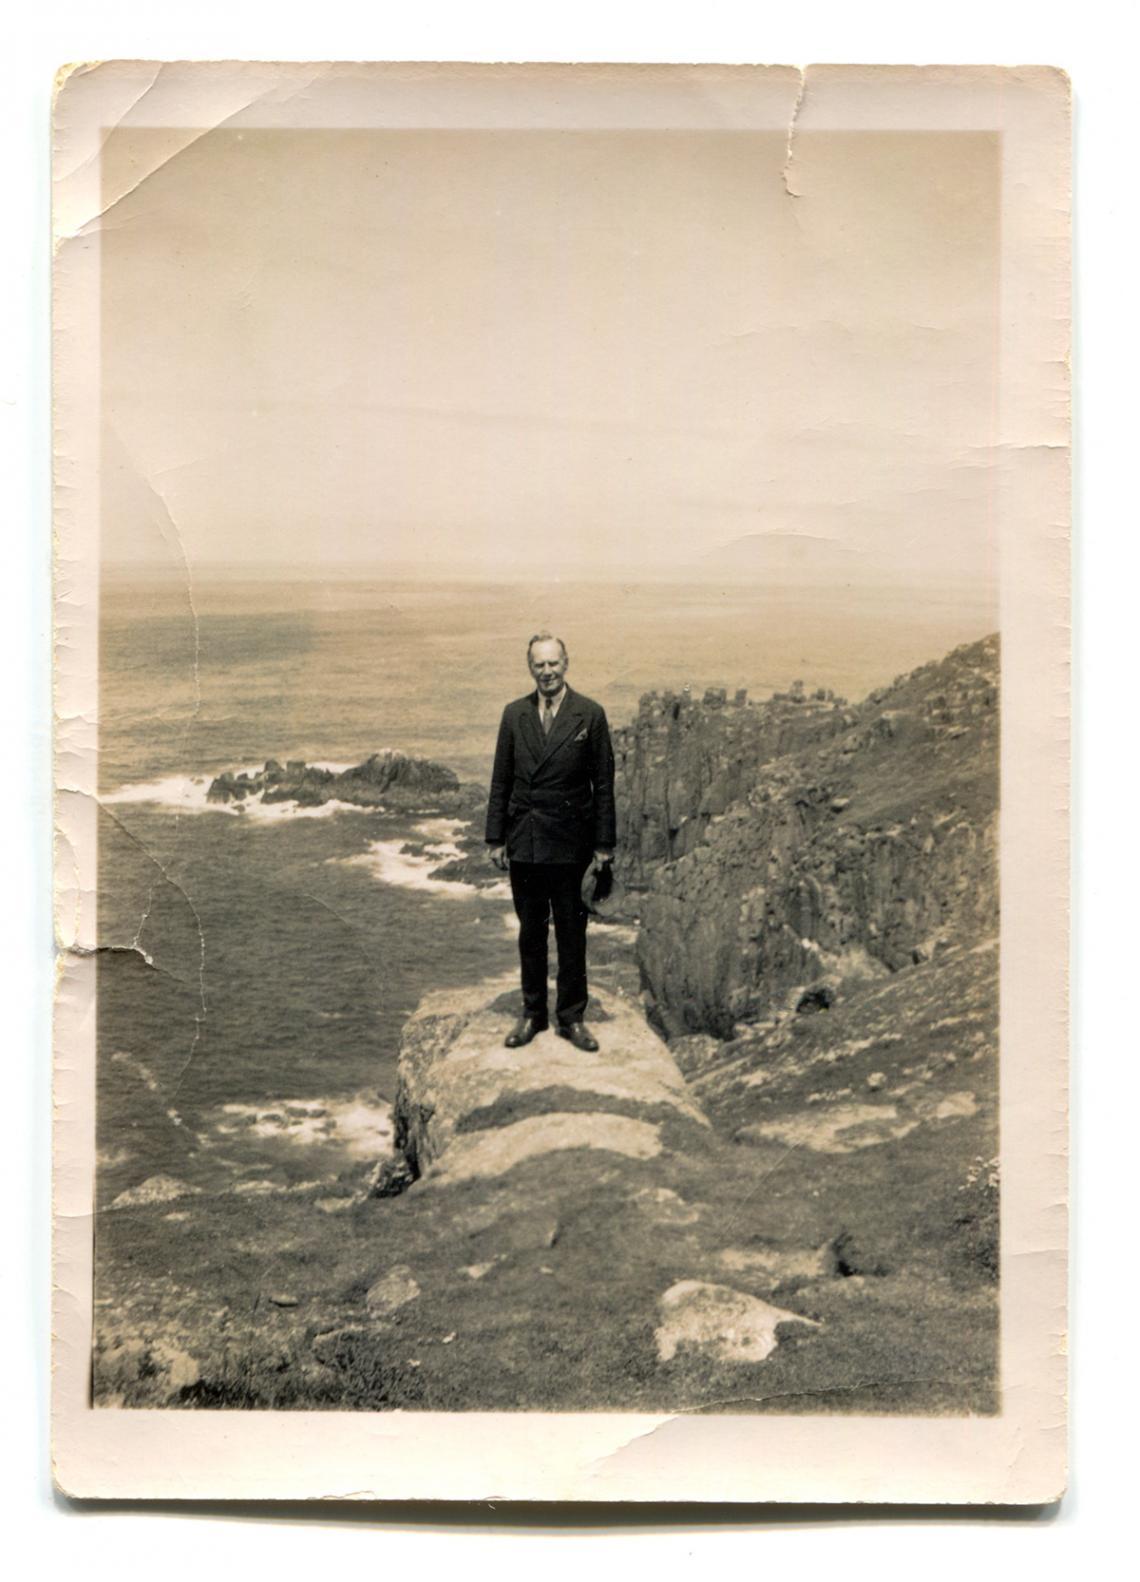 Frank Latham at Land's End